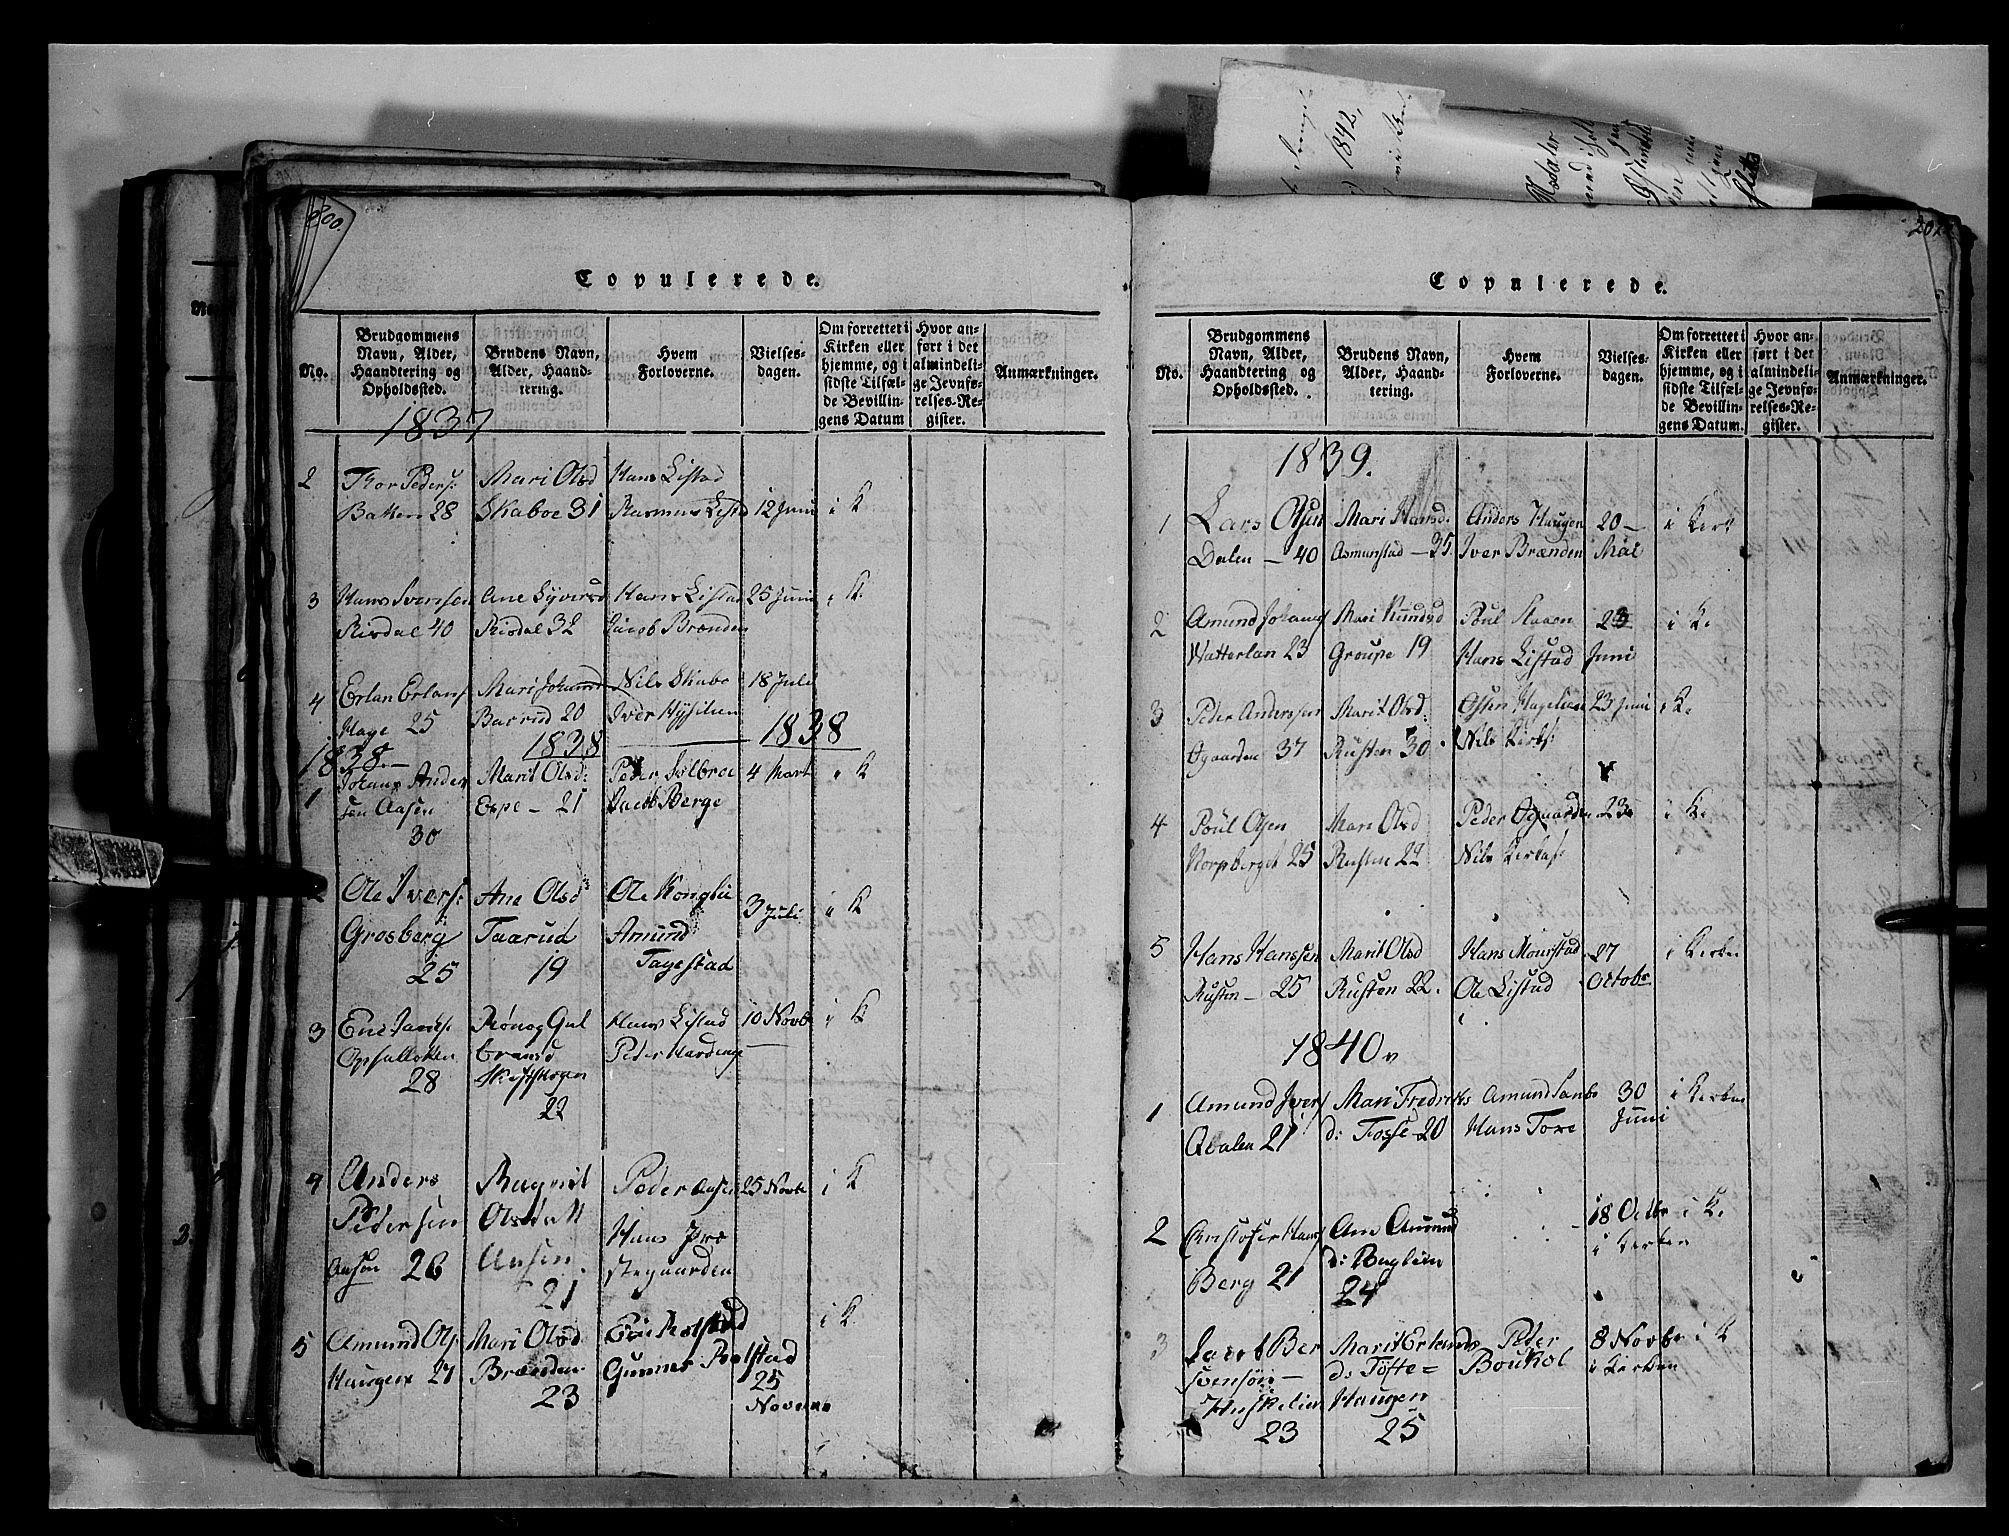 SAH, Fron prestekontor, H/Ha/Hab/L0003: Klokkerbok nr. 3, 1816-1850, s. 201